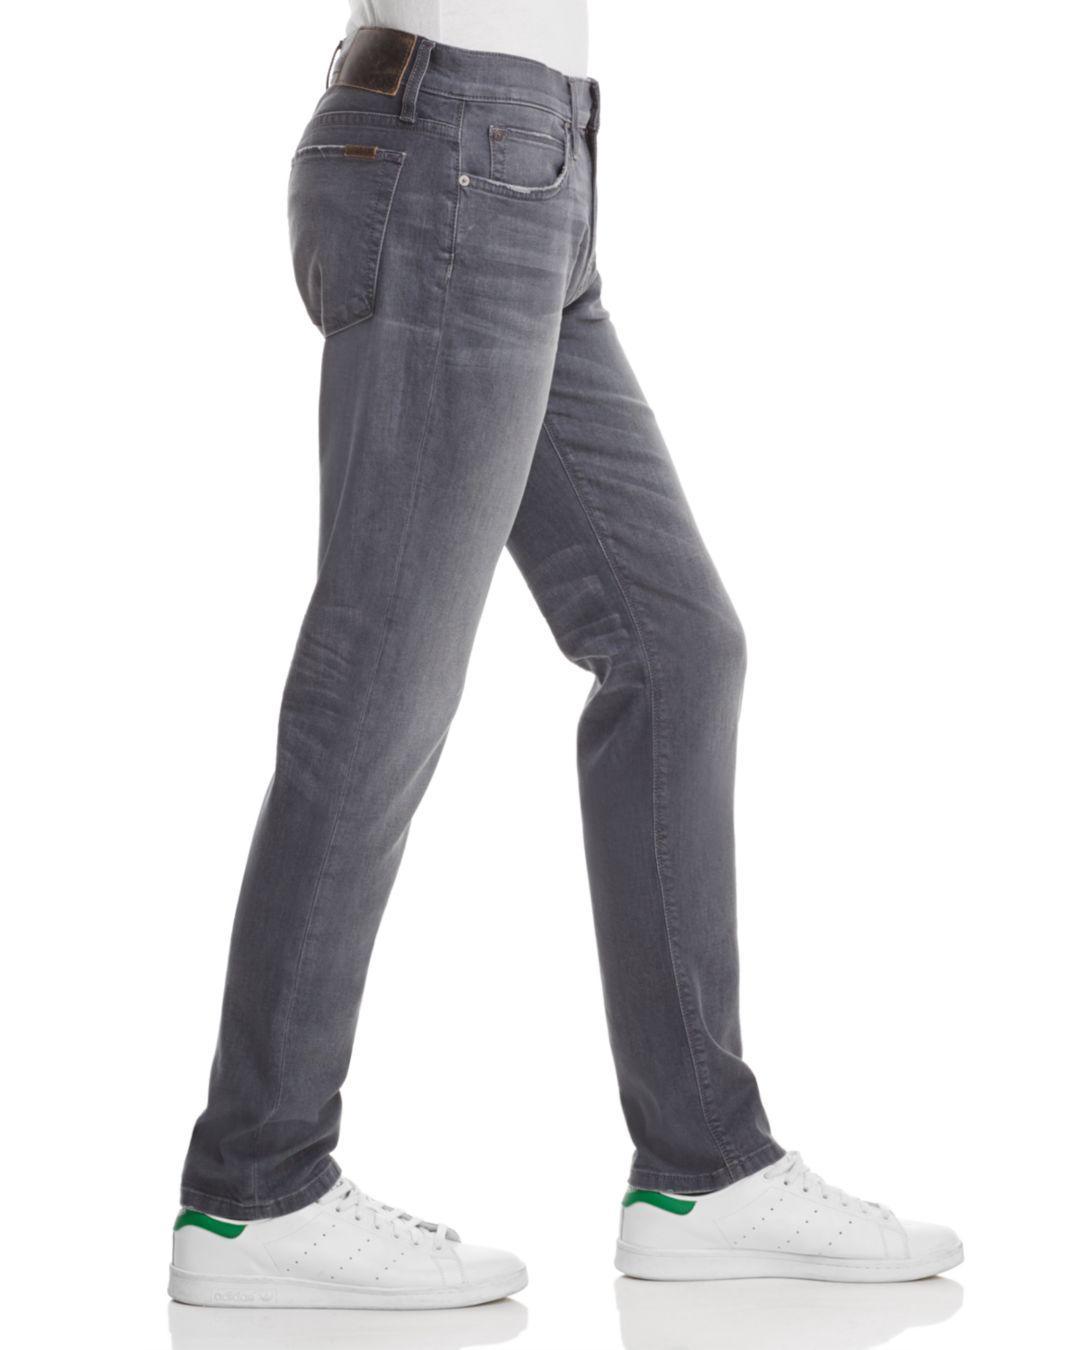 Joe's Jeans Denim Kinetic Collection Slim Fit Jeans In Kenner for Men